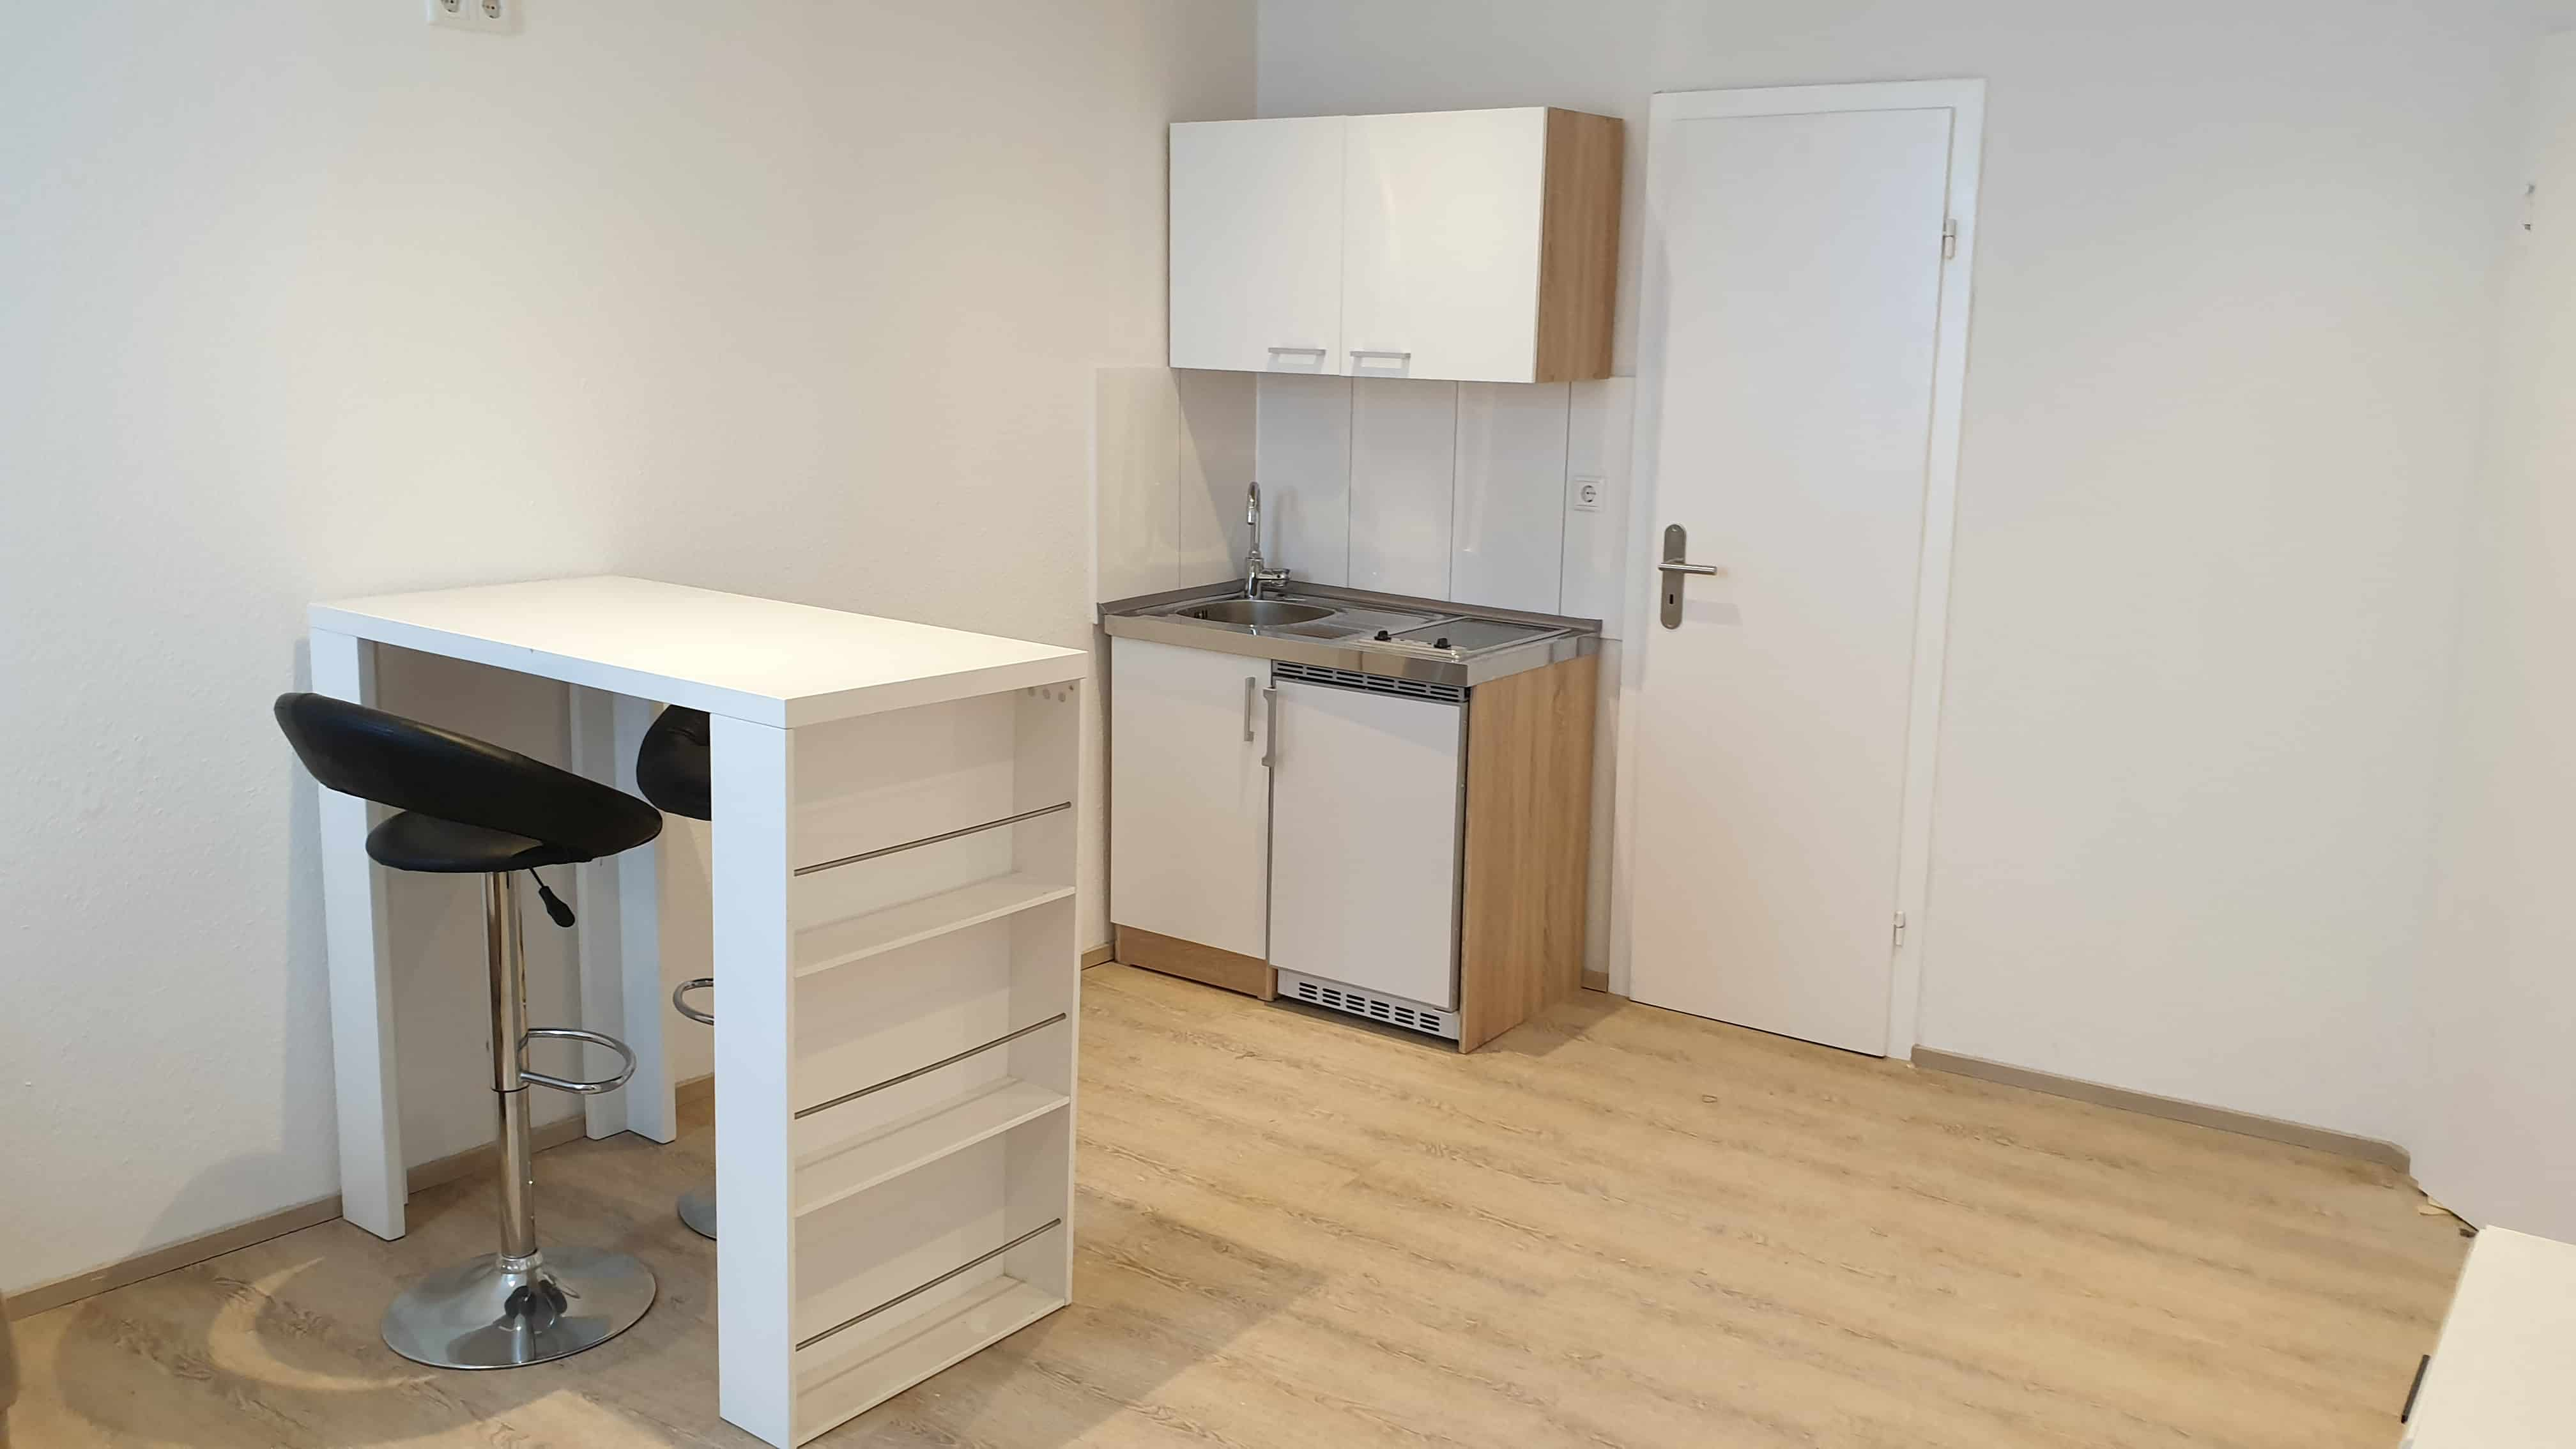 1-Zimmer Apartment in Iserlohn